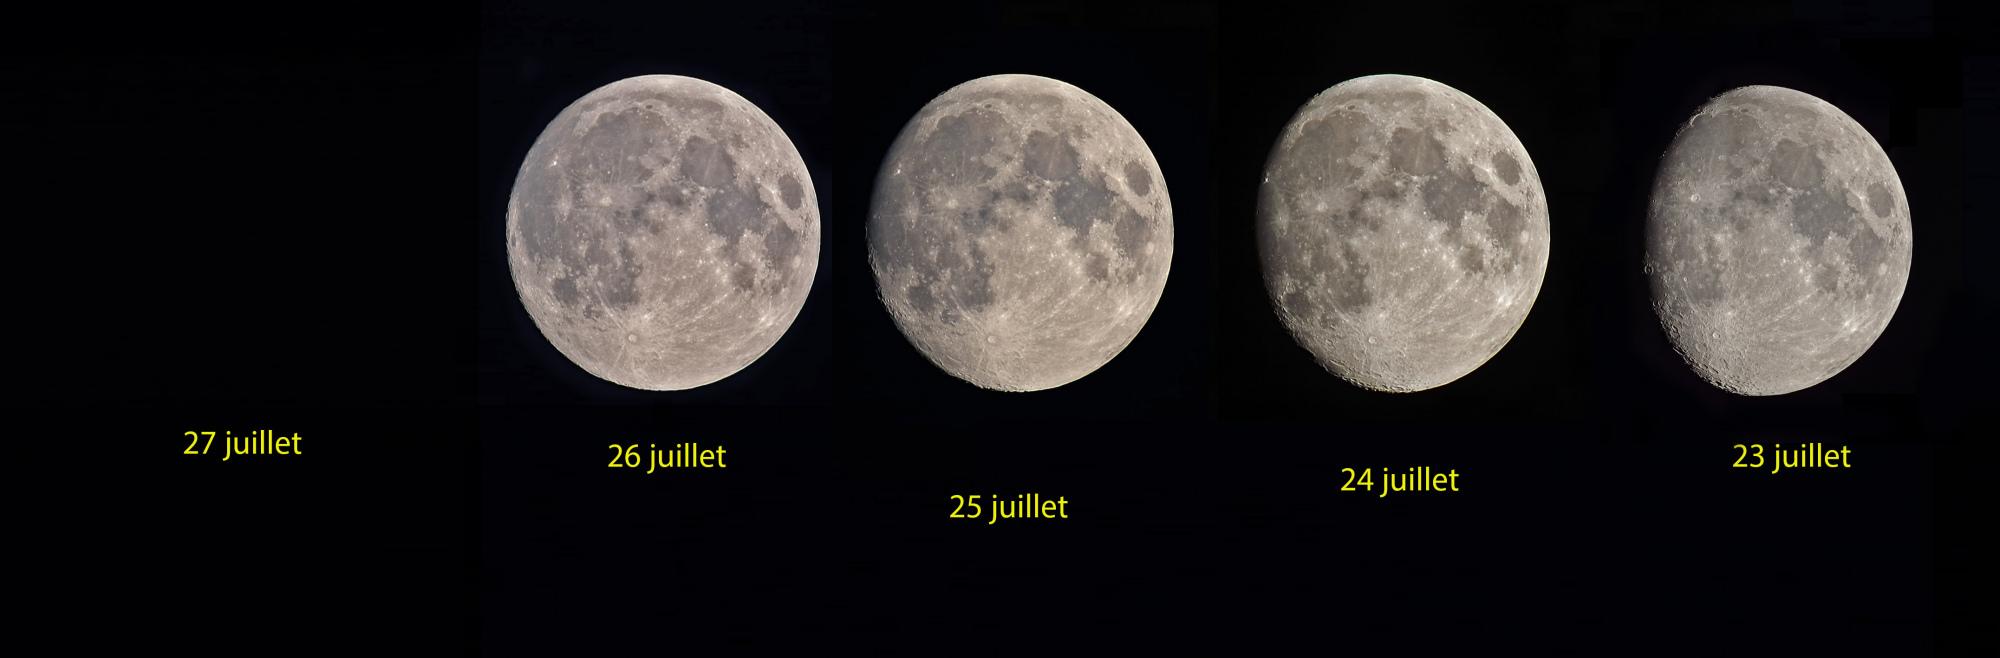 Lune 27 juillet montage.jpg